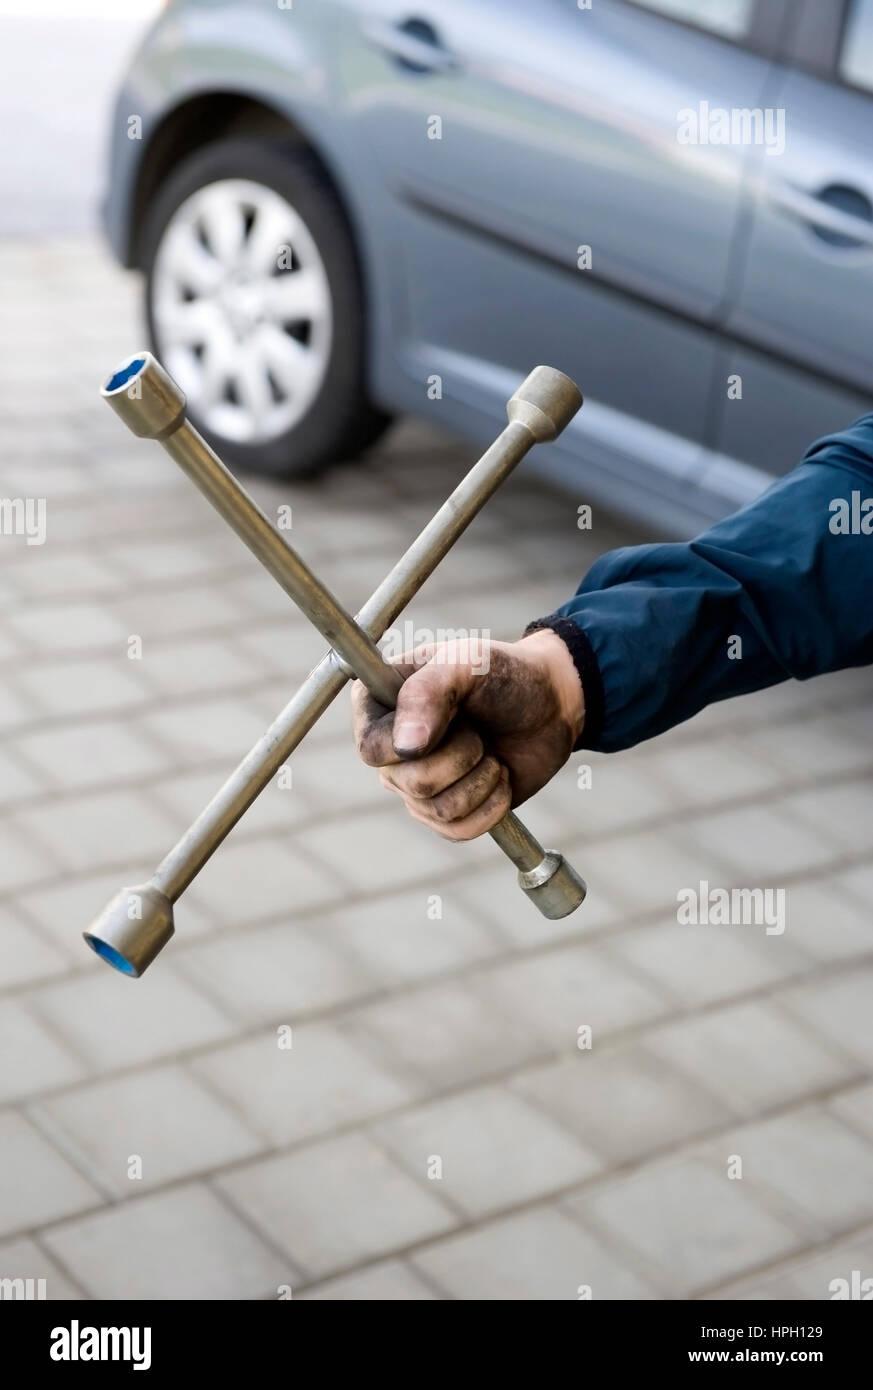 Mechaniker Stock Photos & Mechaniker Stock Images - Alamy